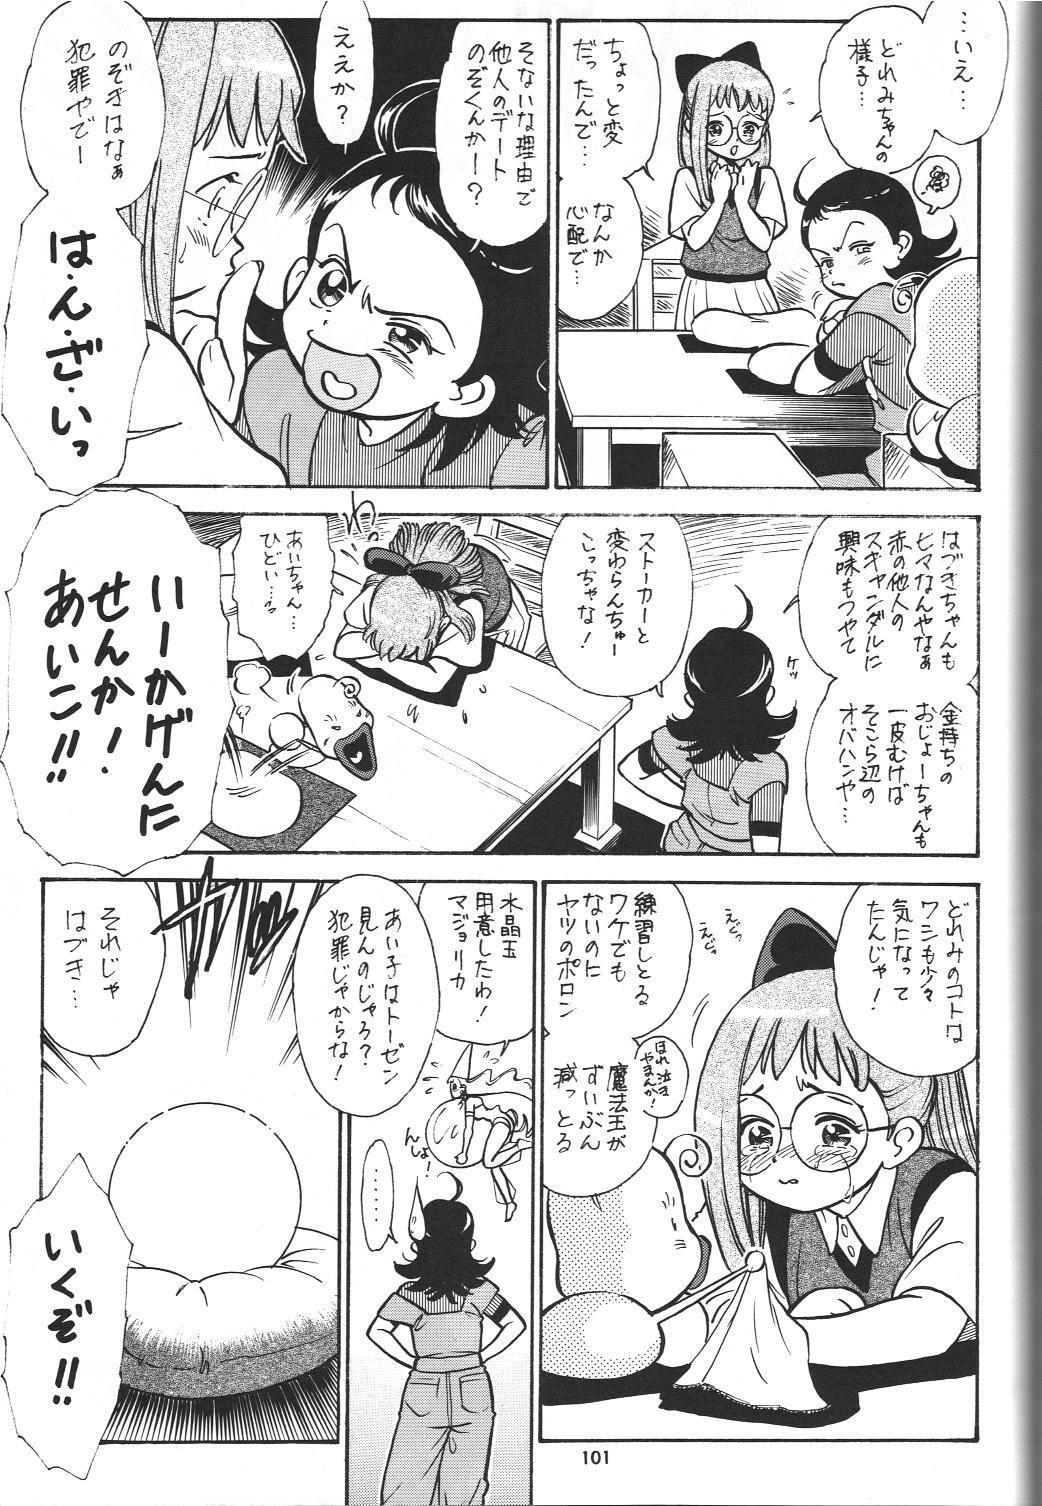 (C56) [Tsurikichi Doumei (Various)] Sengoku Rock - Nan Demo-R (Various) 101